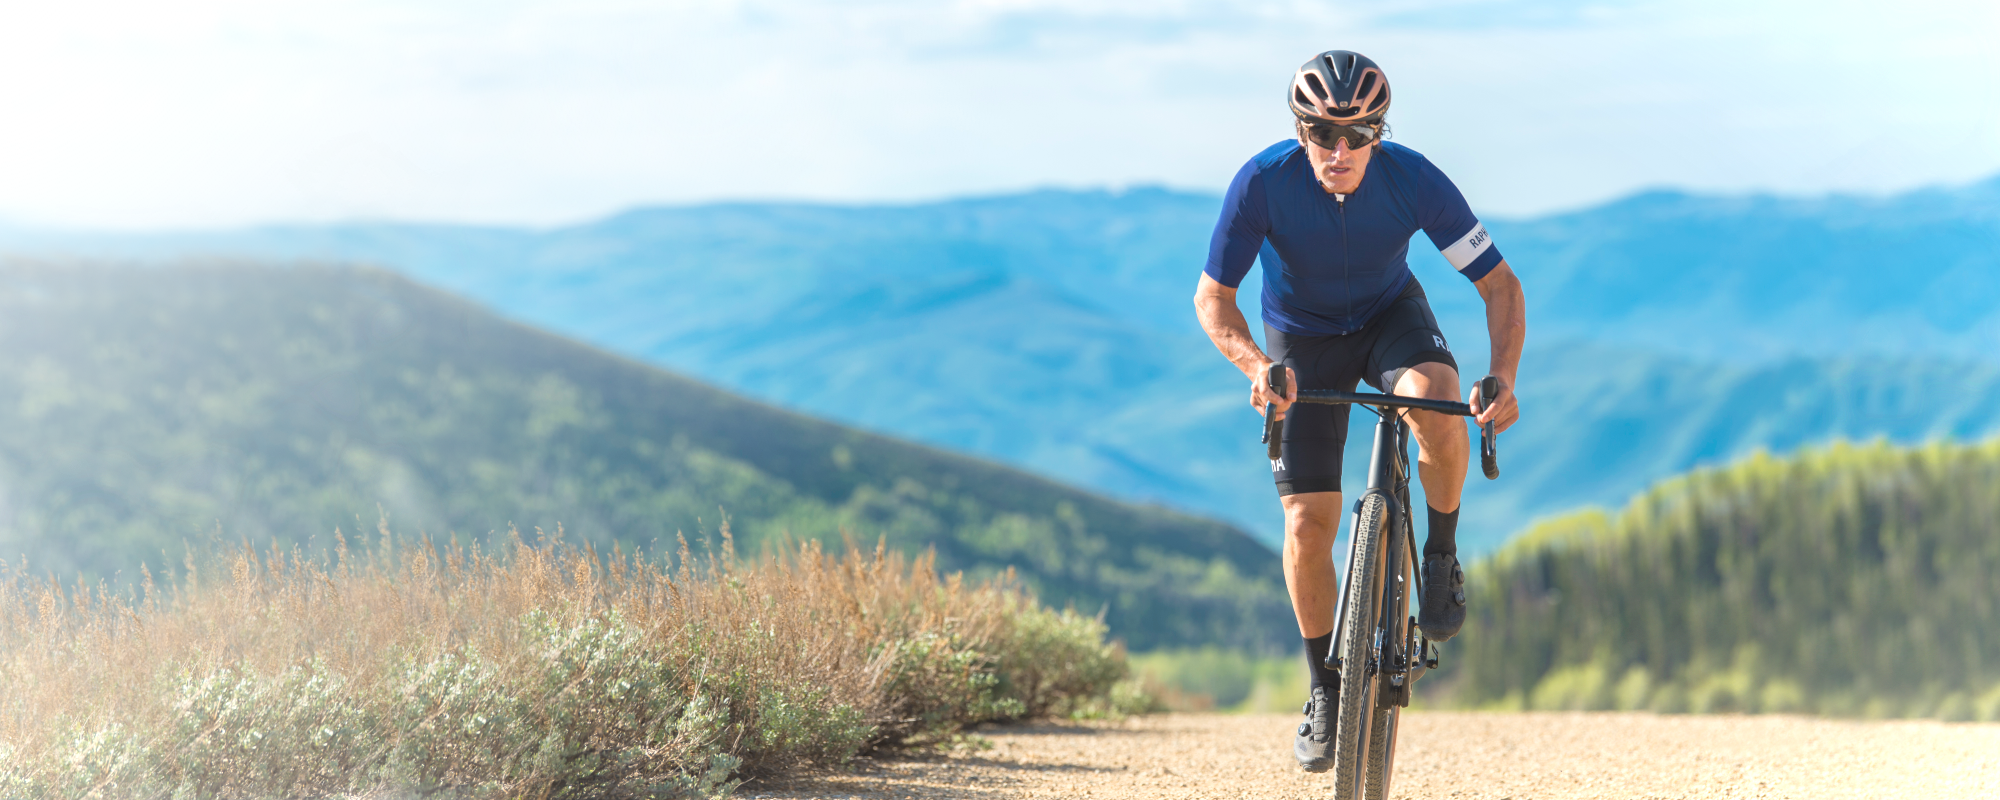 Gravel cyclist wearing Rudy Project Sunglasses & Bike Helmet